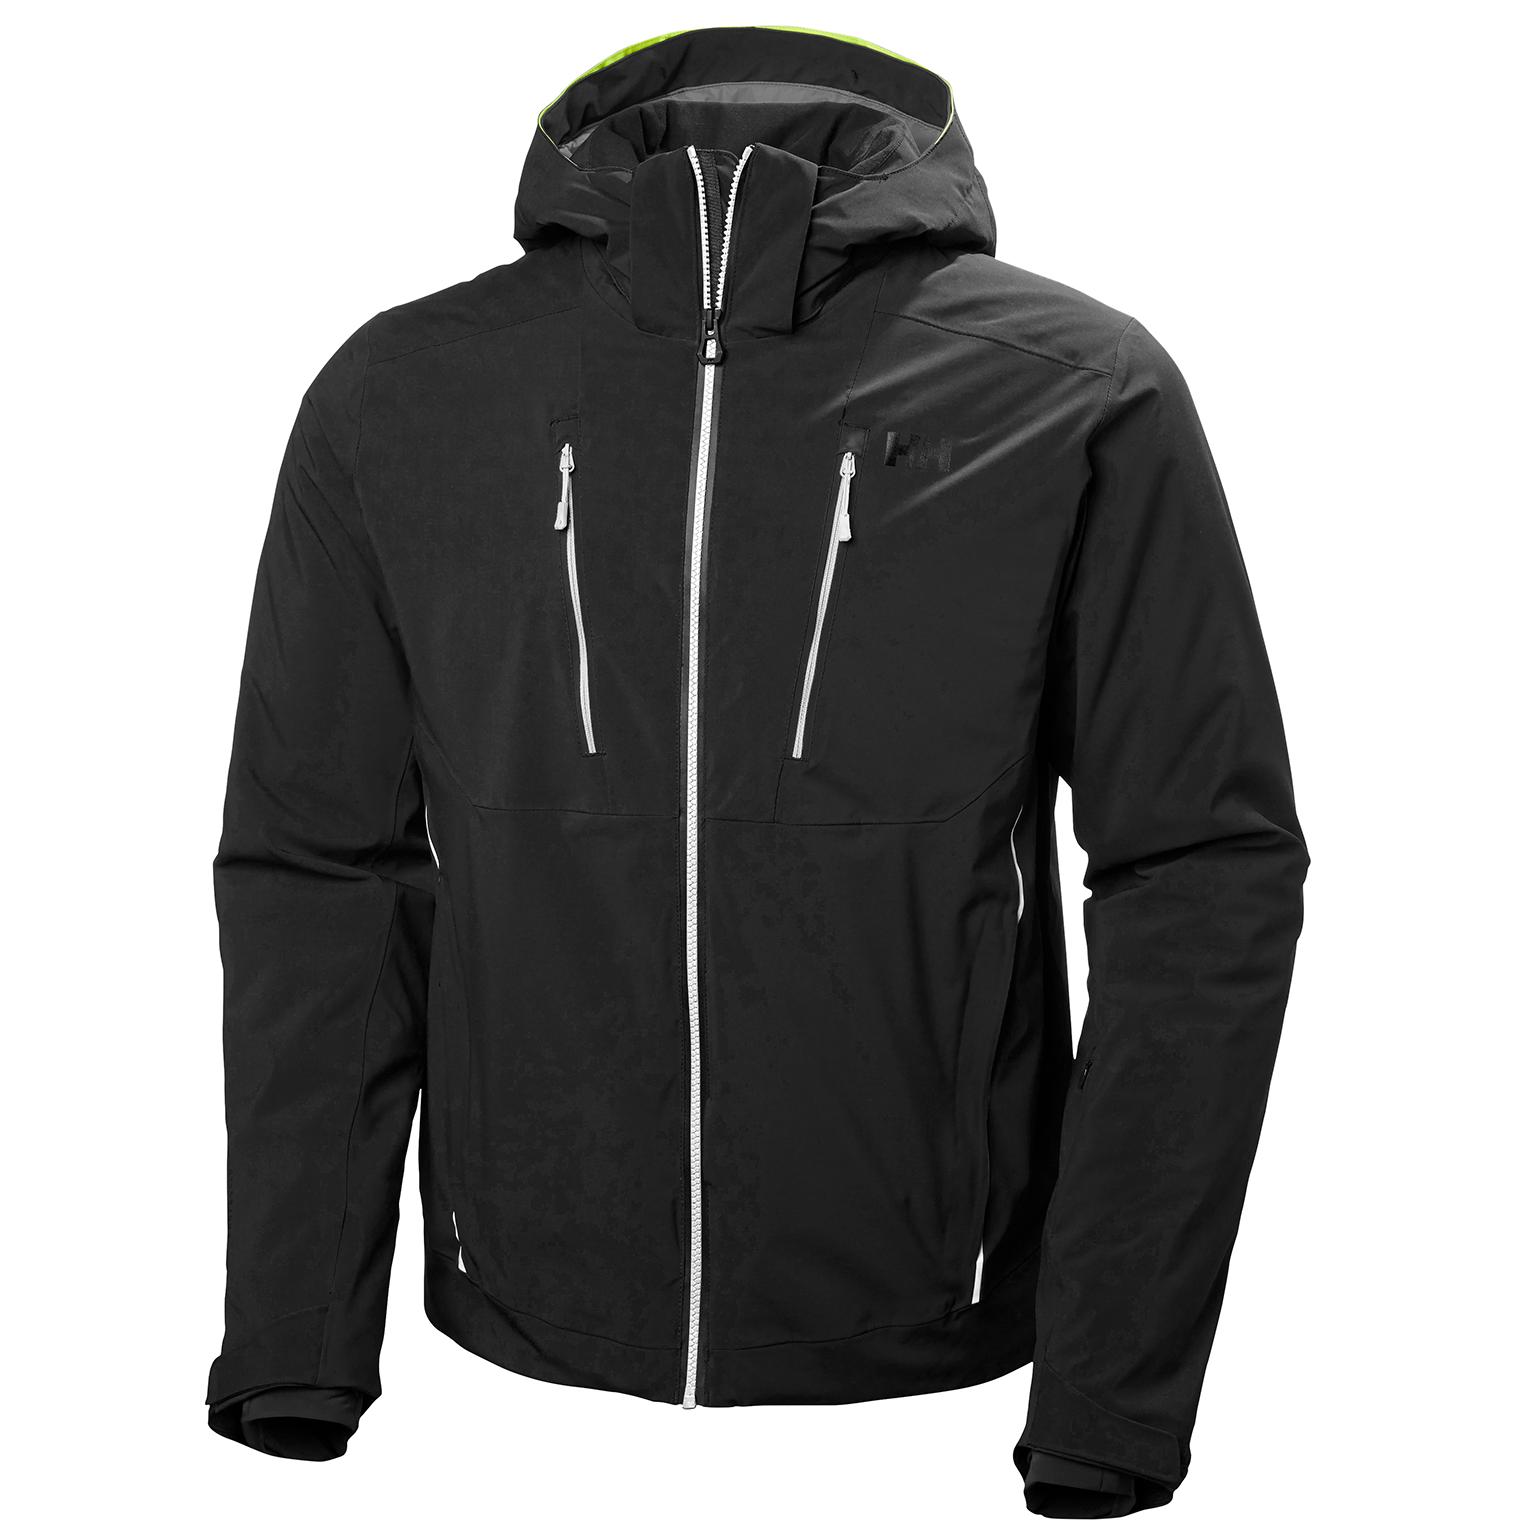 Alpha 3.0 Ski Jacket - 140 Years of Innovation  9cdc2517df